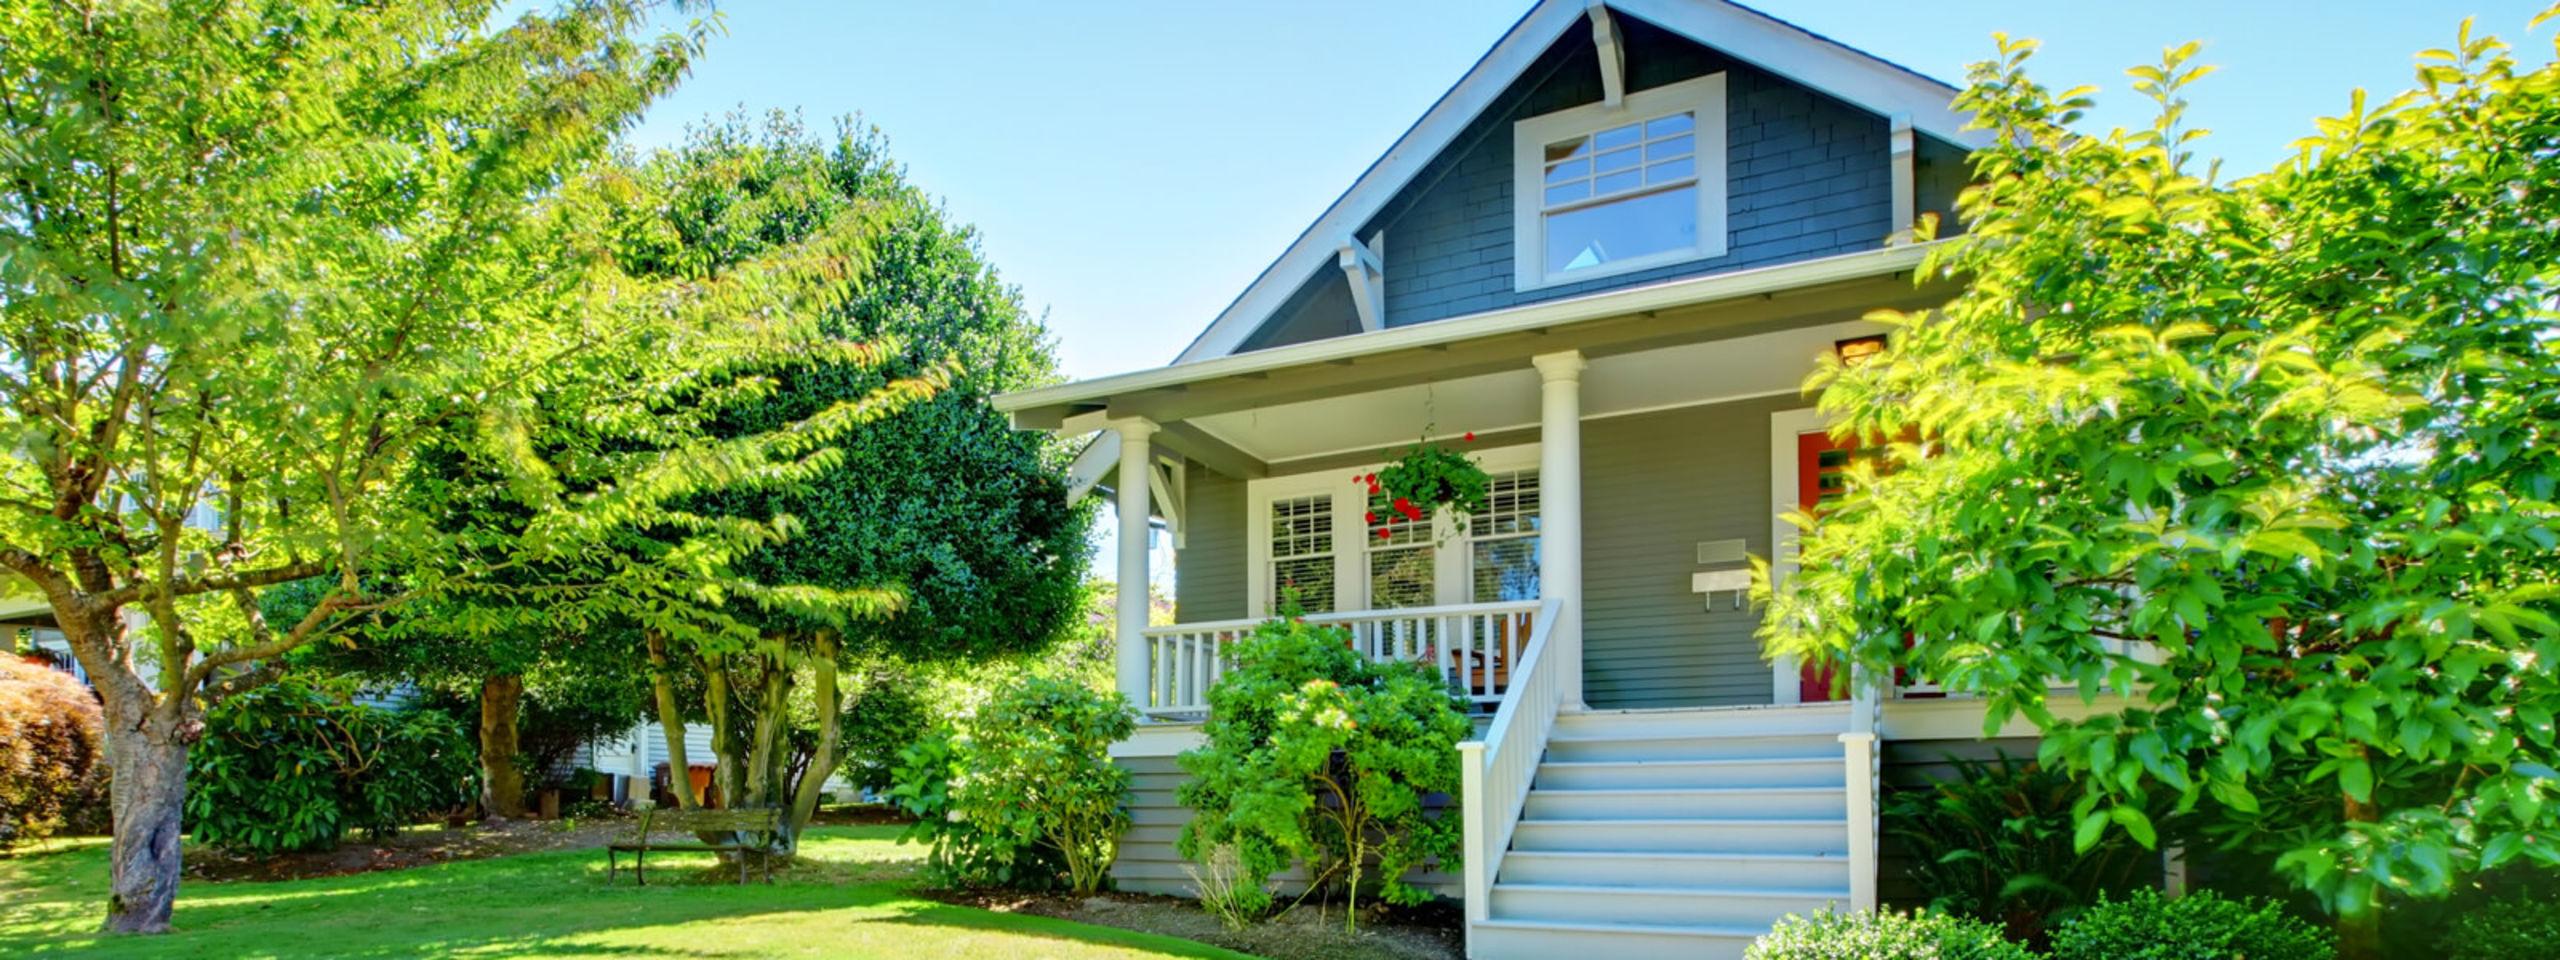 Discover fresh, modern residences